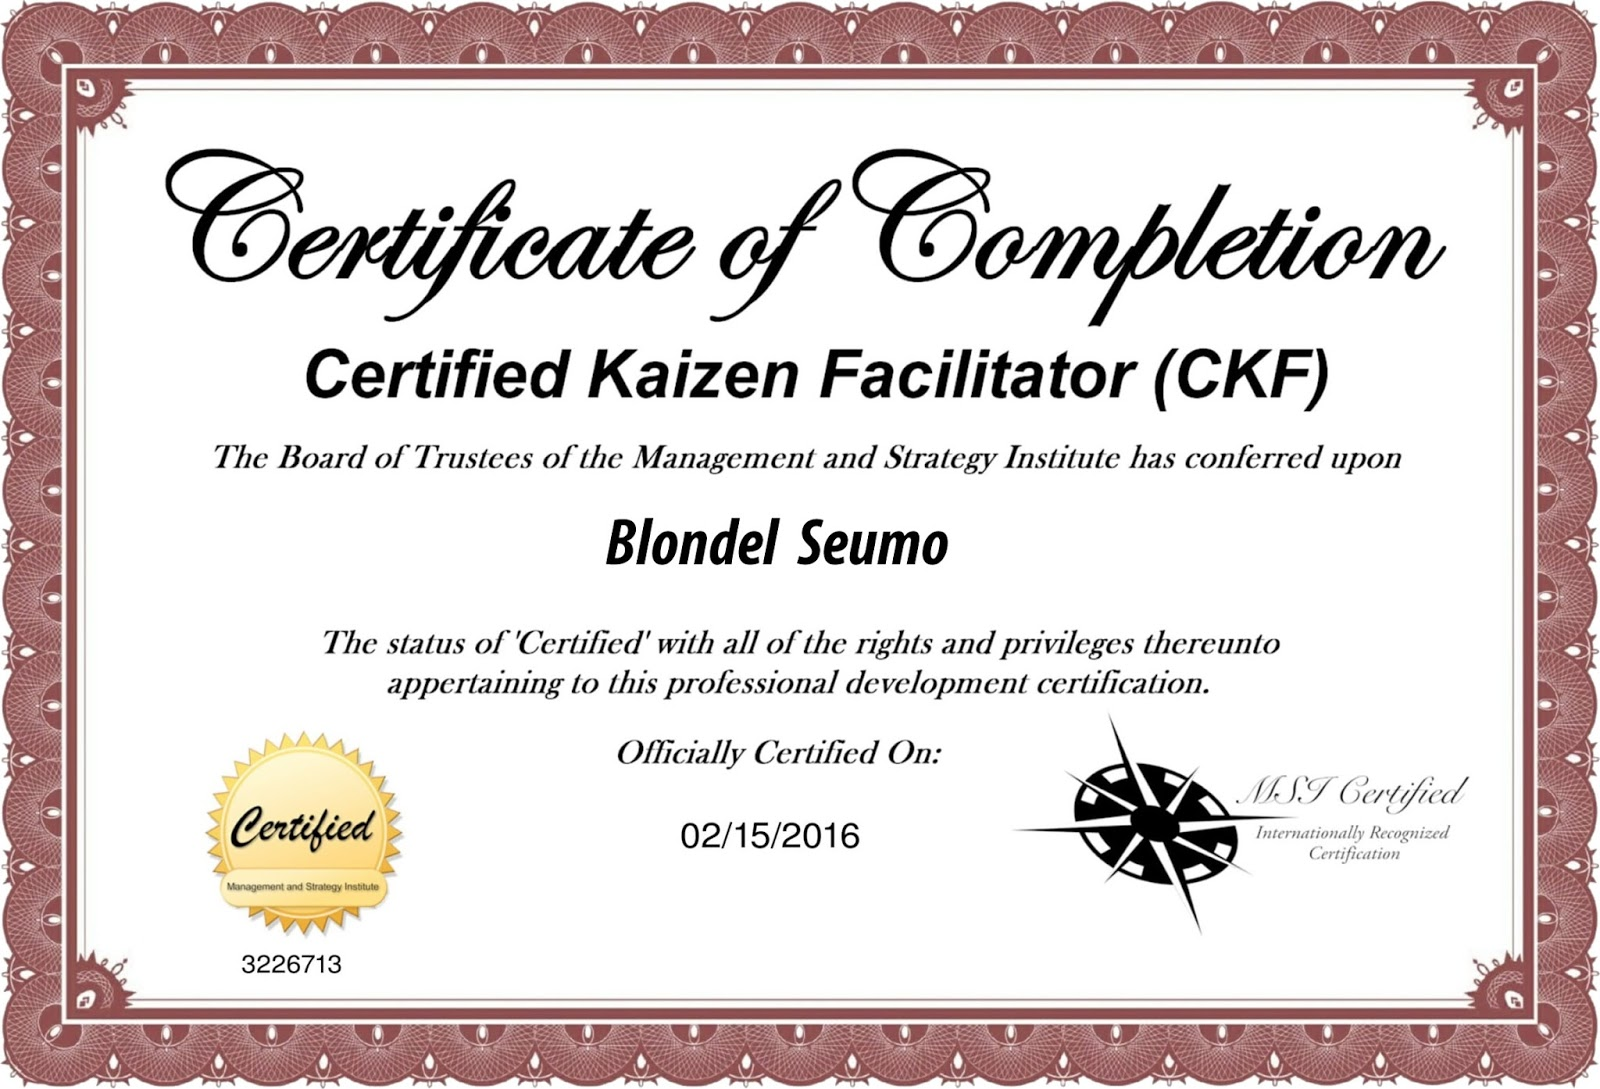 Kaizen Certification (with Blondel Seumo)